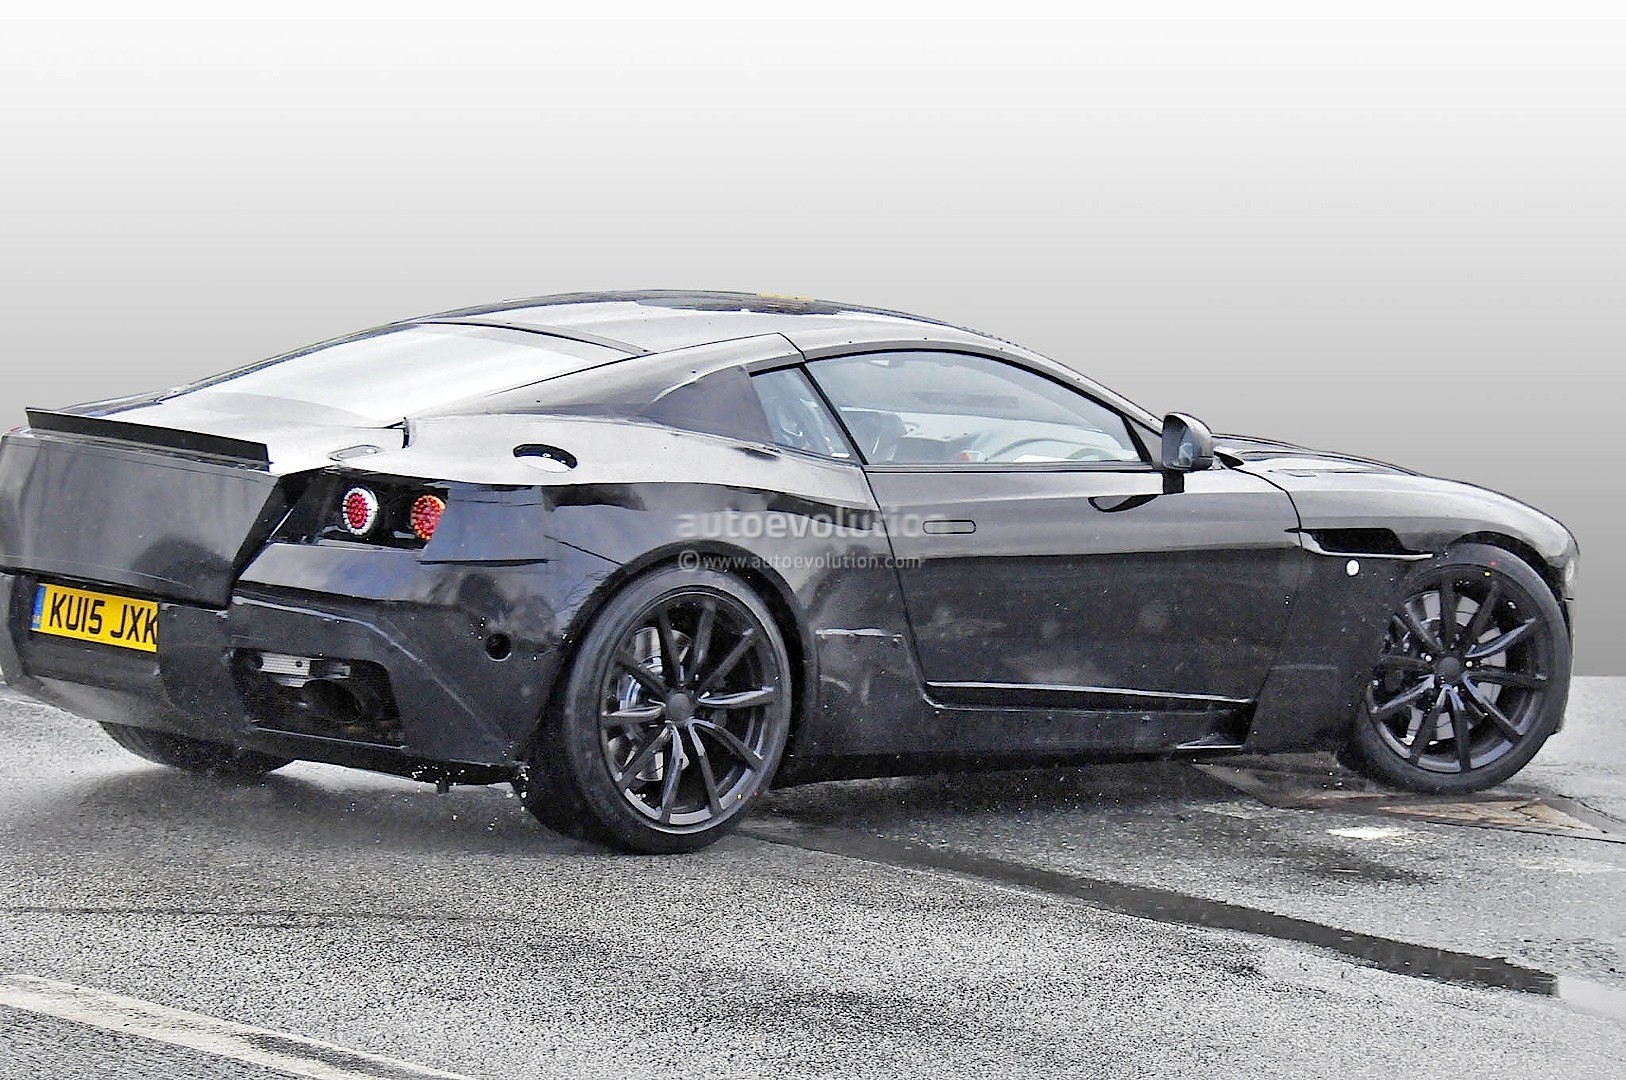 2016 - [Aston Martin] DB11 2017-aston-martin-db9-successor-prototype-spyshots-show-db10-like-silhouette-digital-dashboard-intercoolers_3